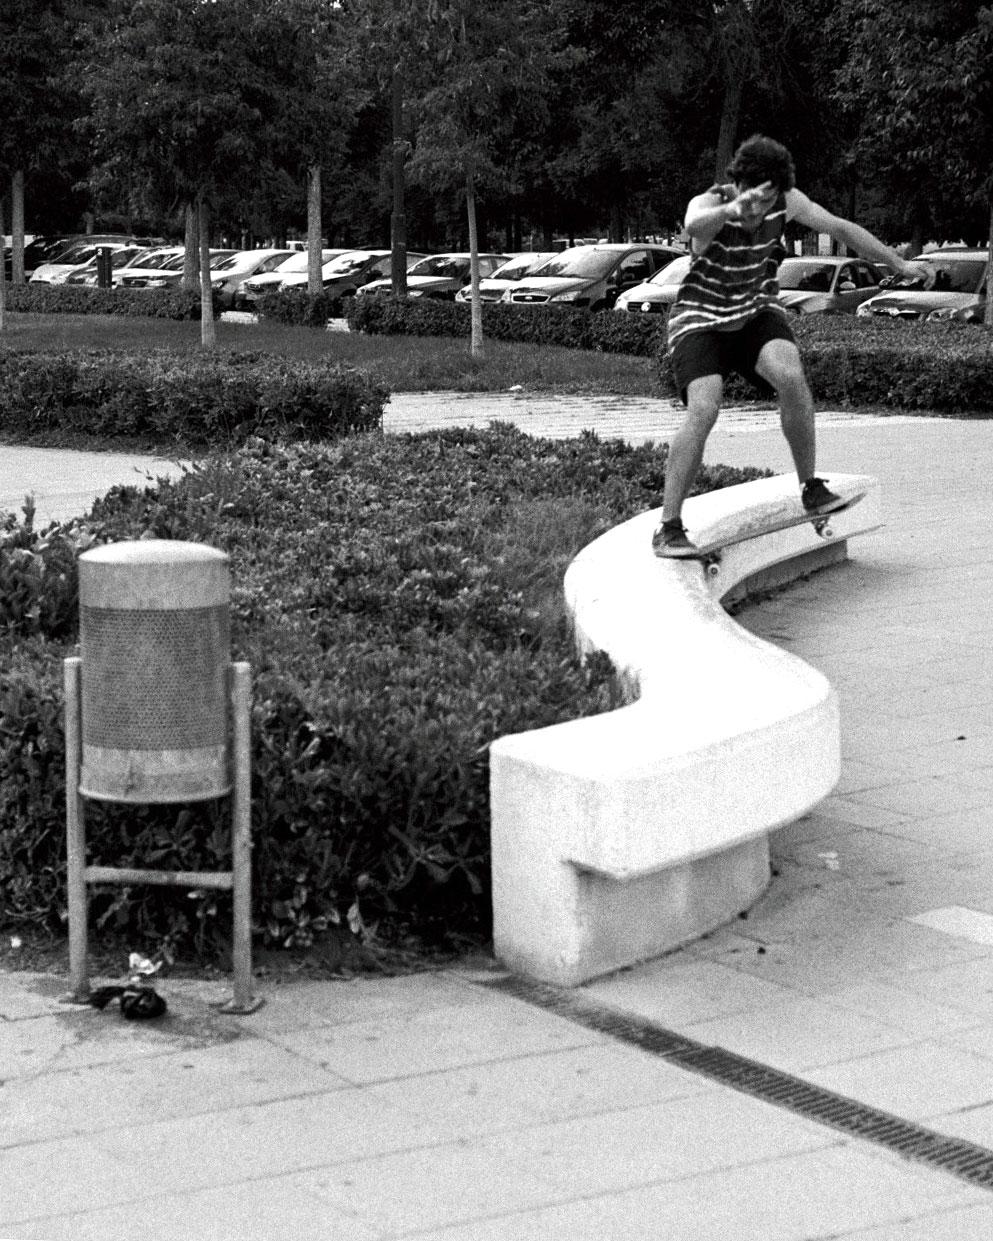 Darby Gough - noseslide 270